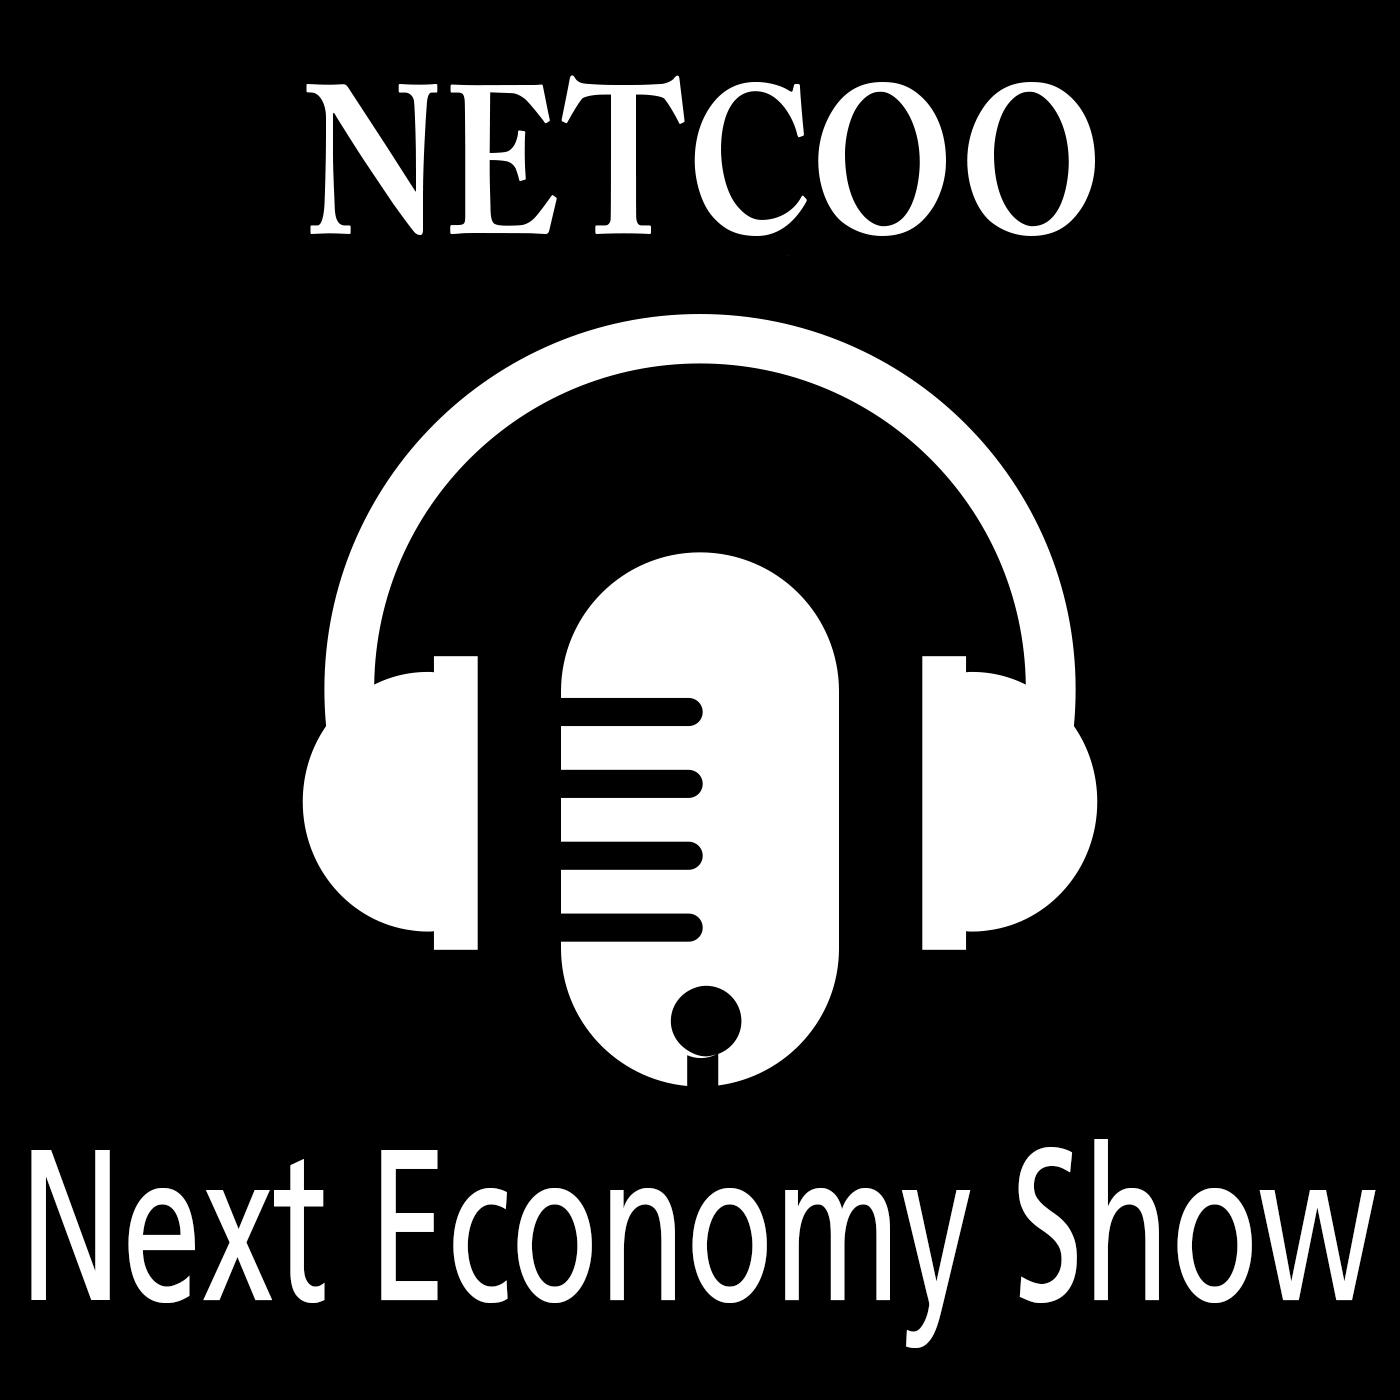 Netcoo Next Economy Show show art